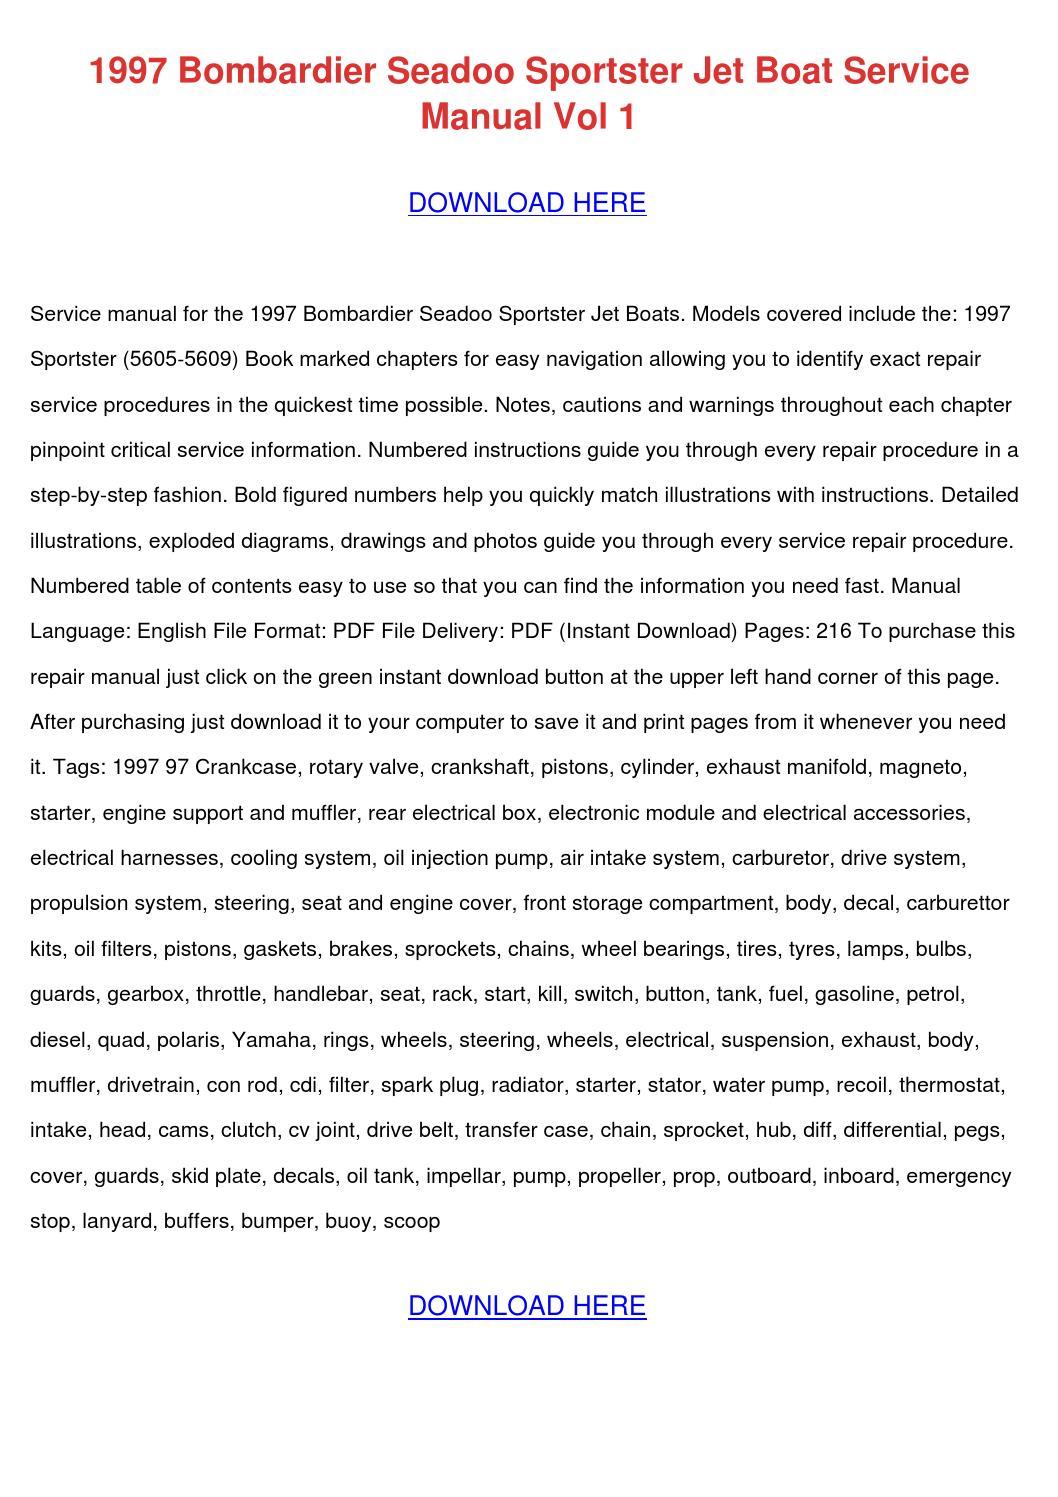 1995 Seadoo Sportster Service Manual